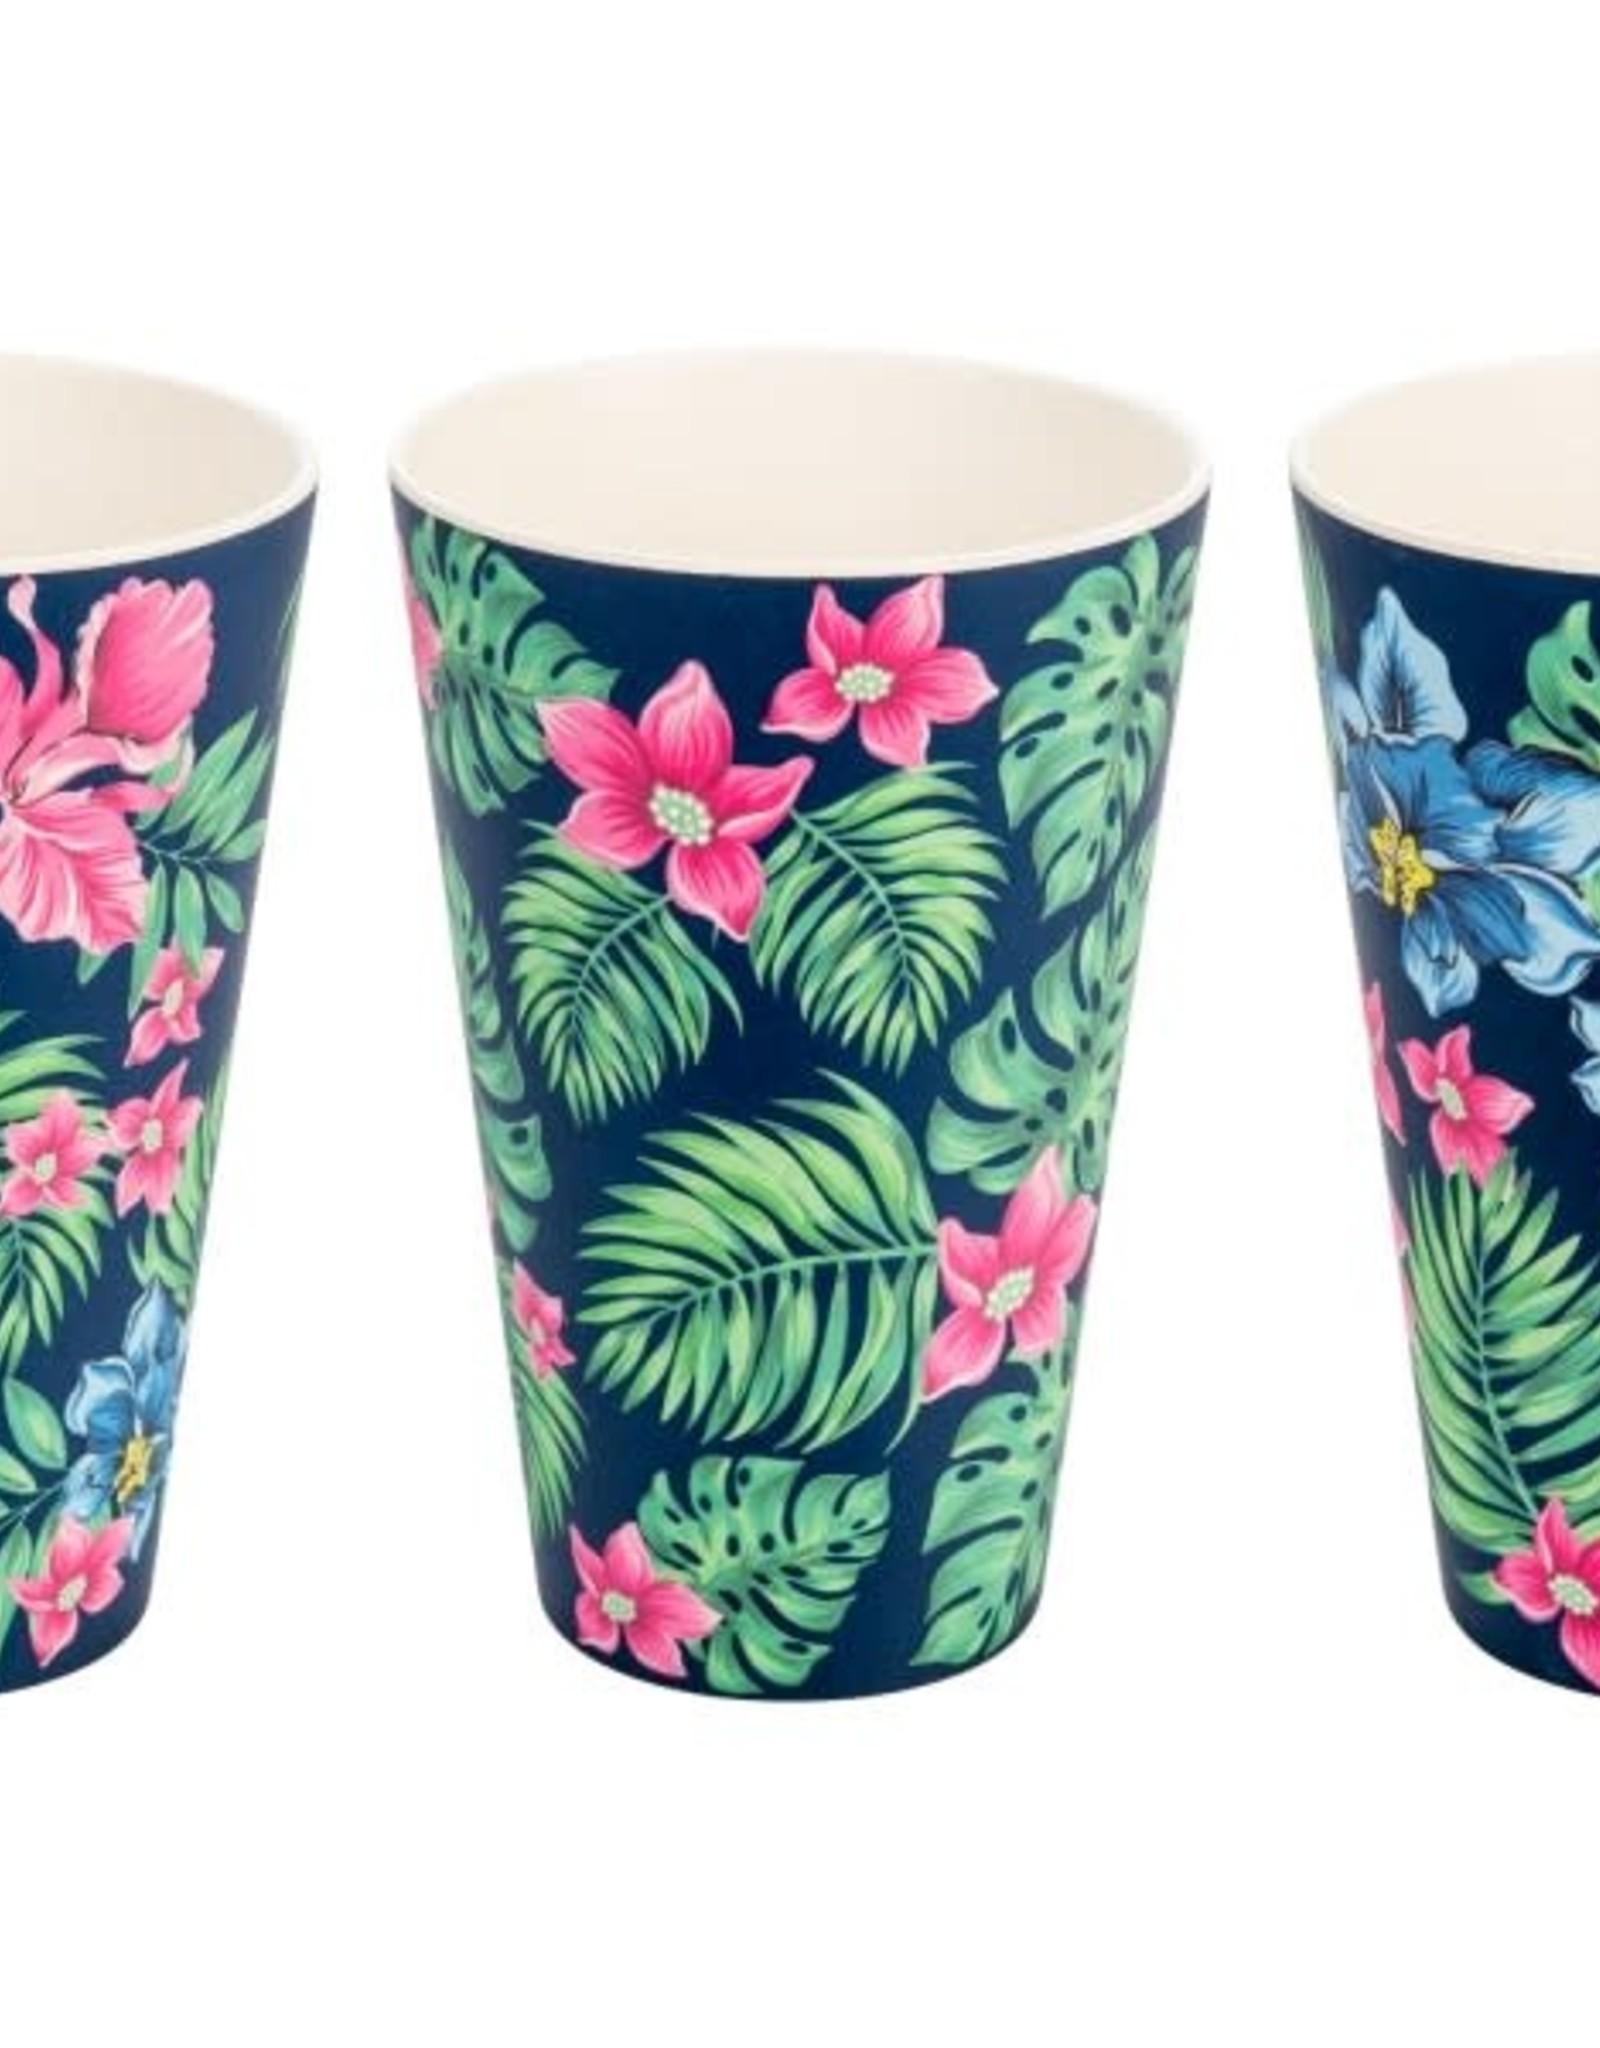 Bamboo Fiber Cups Tropical set of 3